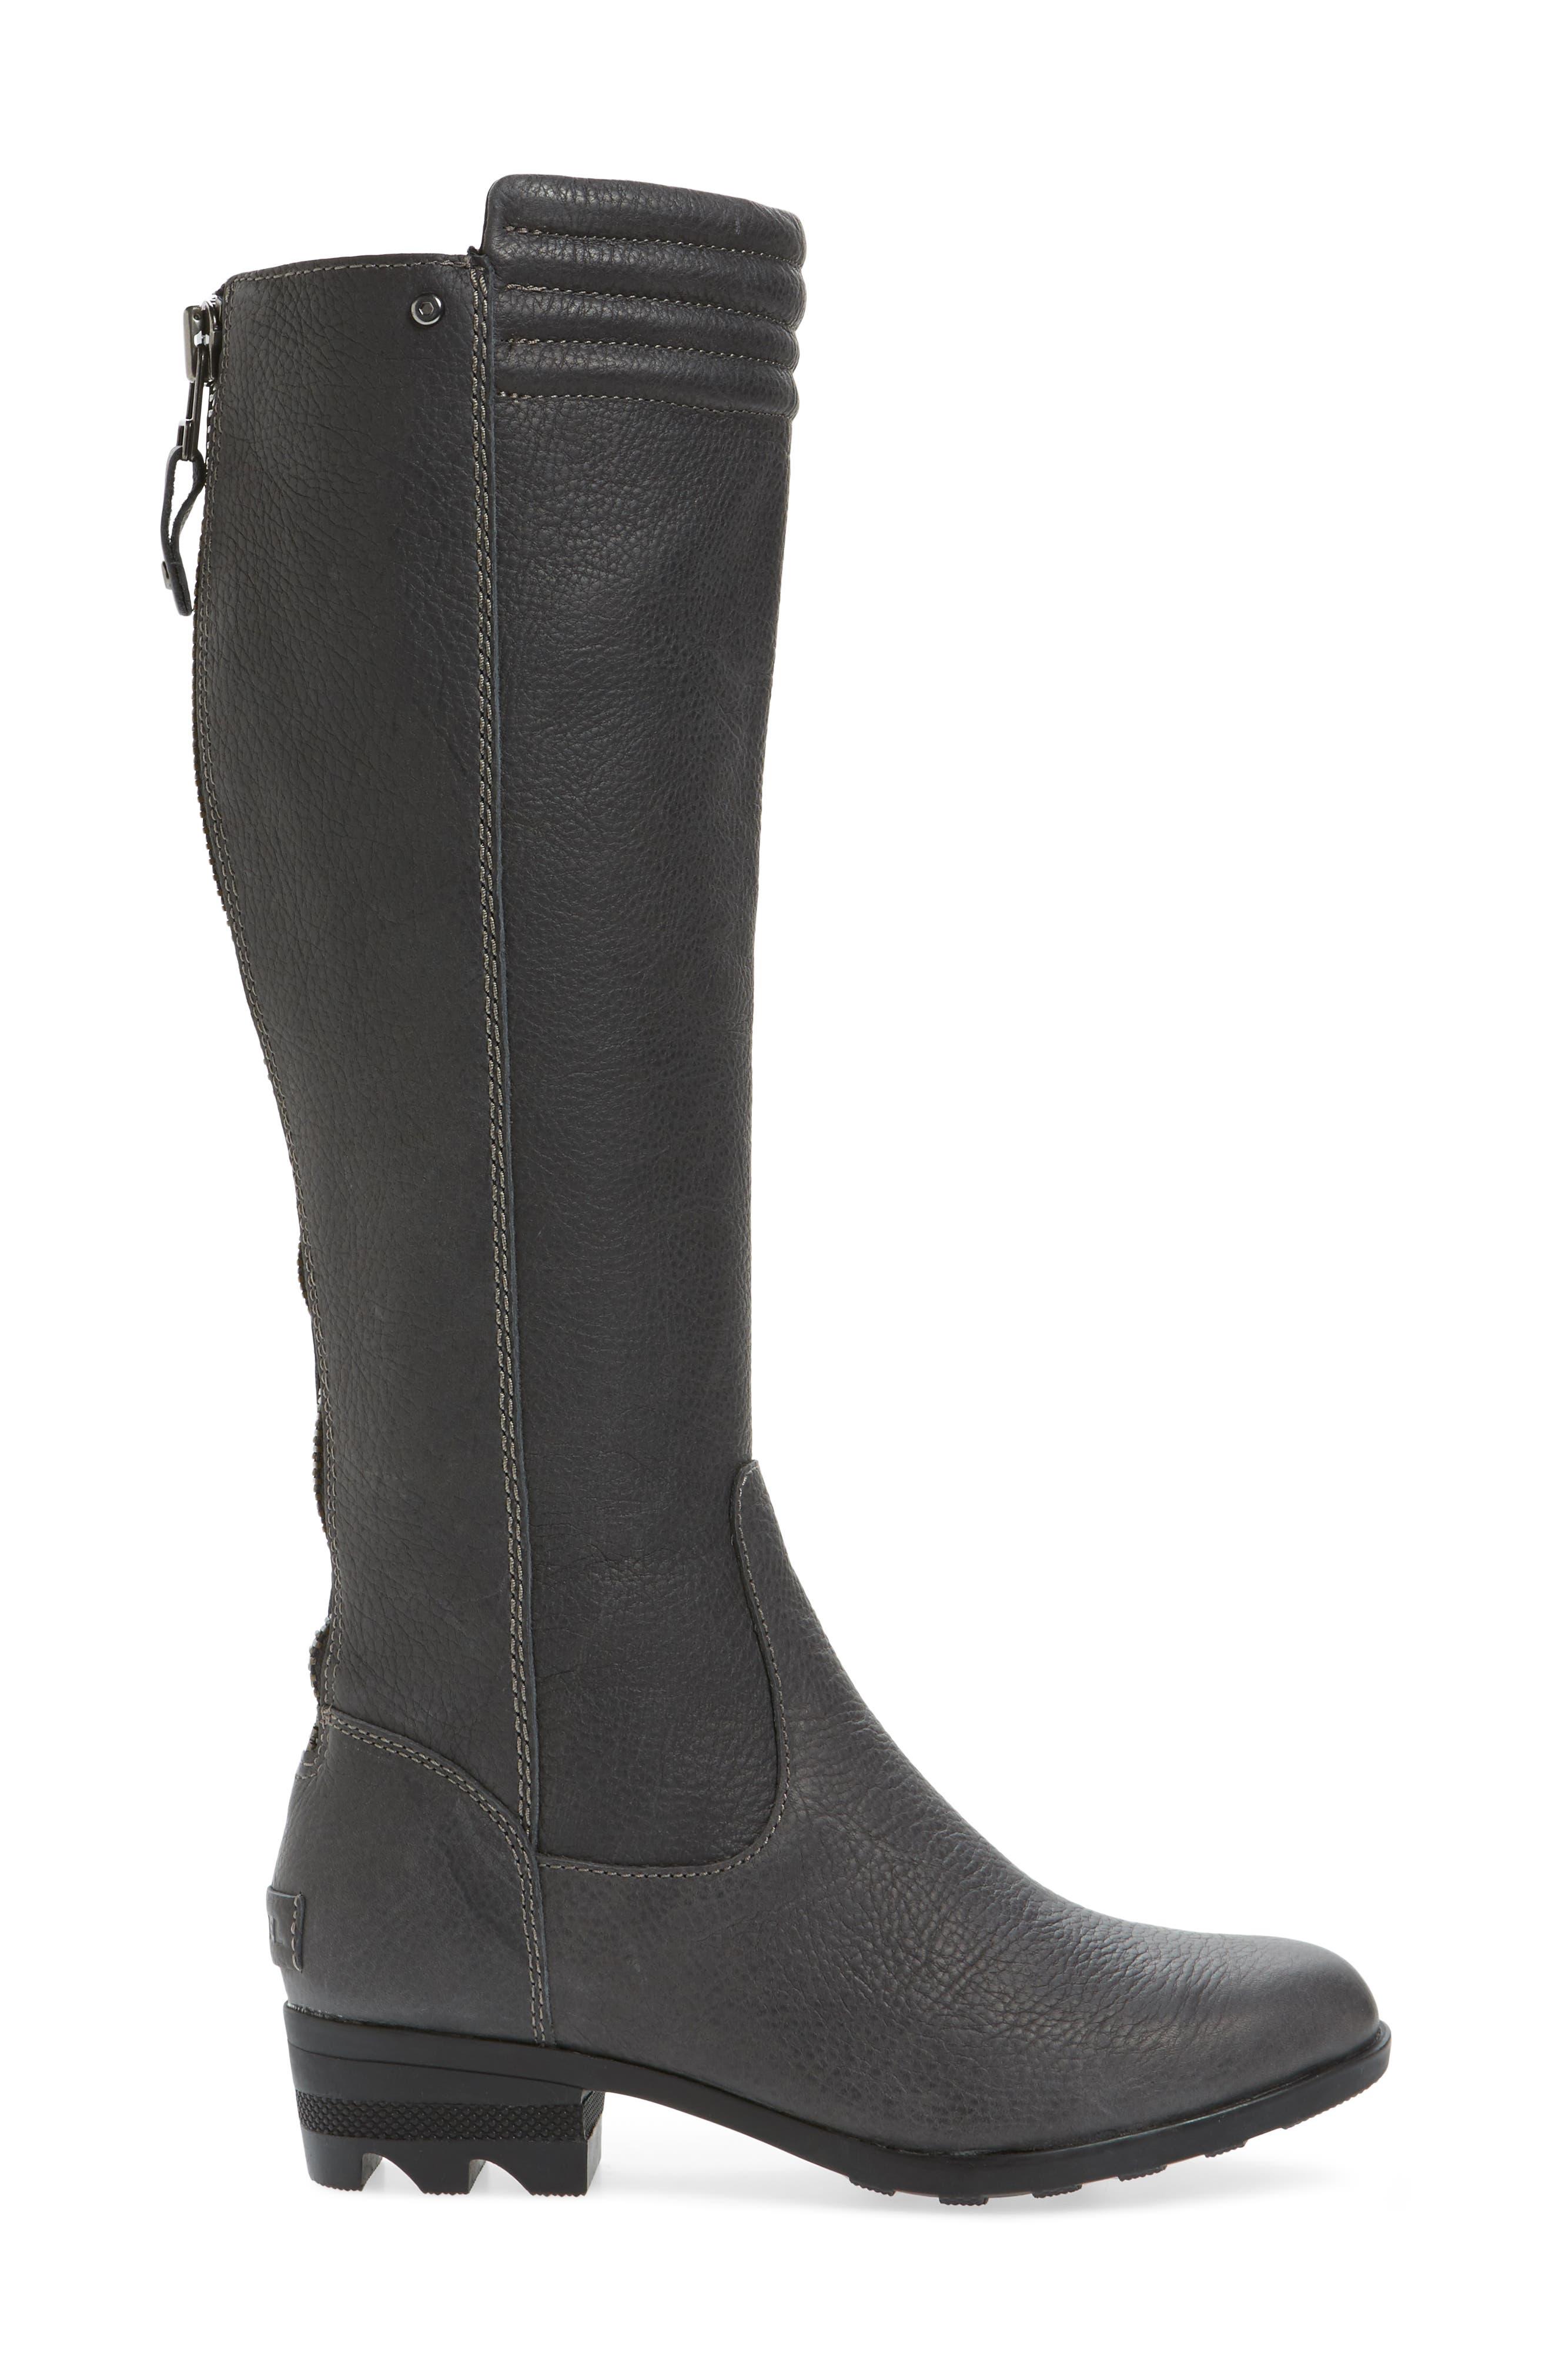 Danica Waterproof Knee High Boot,                             Alternate thumbnail 3, color,                             Quarry/ Black